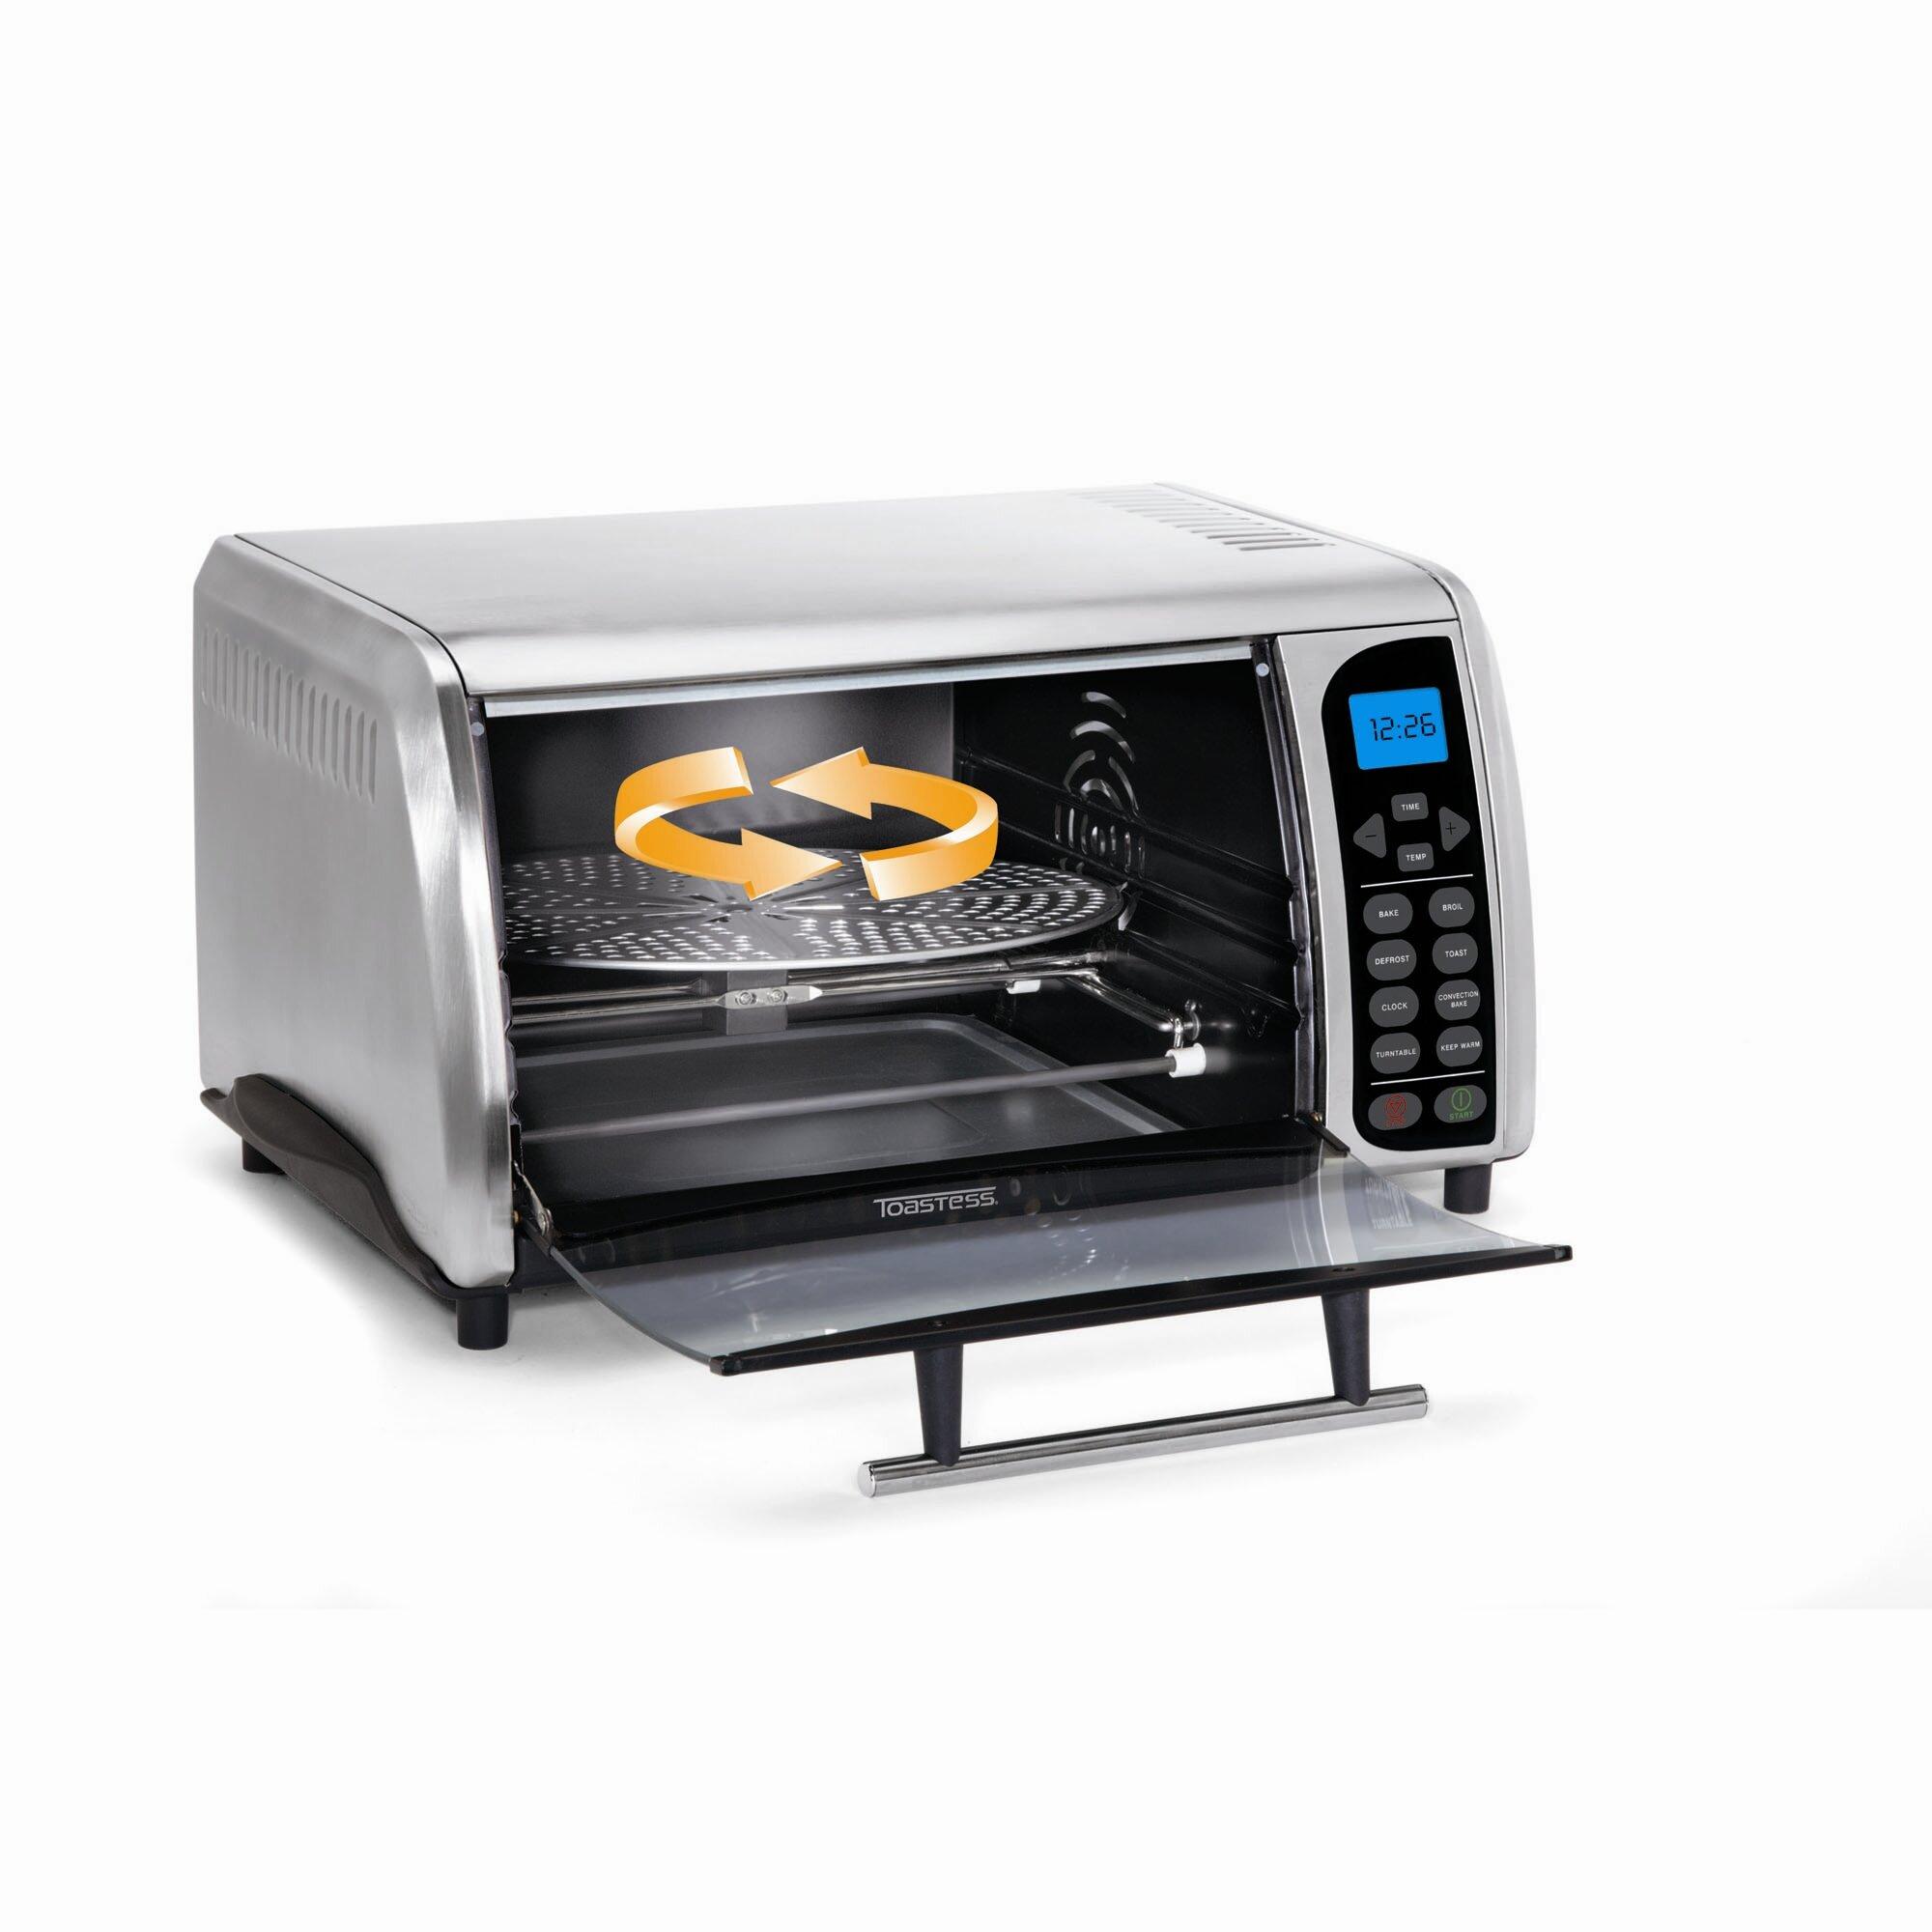 Toasters and Countertop Ovens Toastess SKU: TSS1097